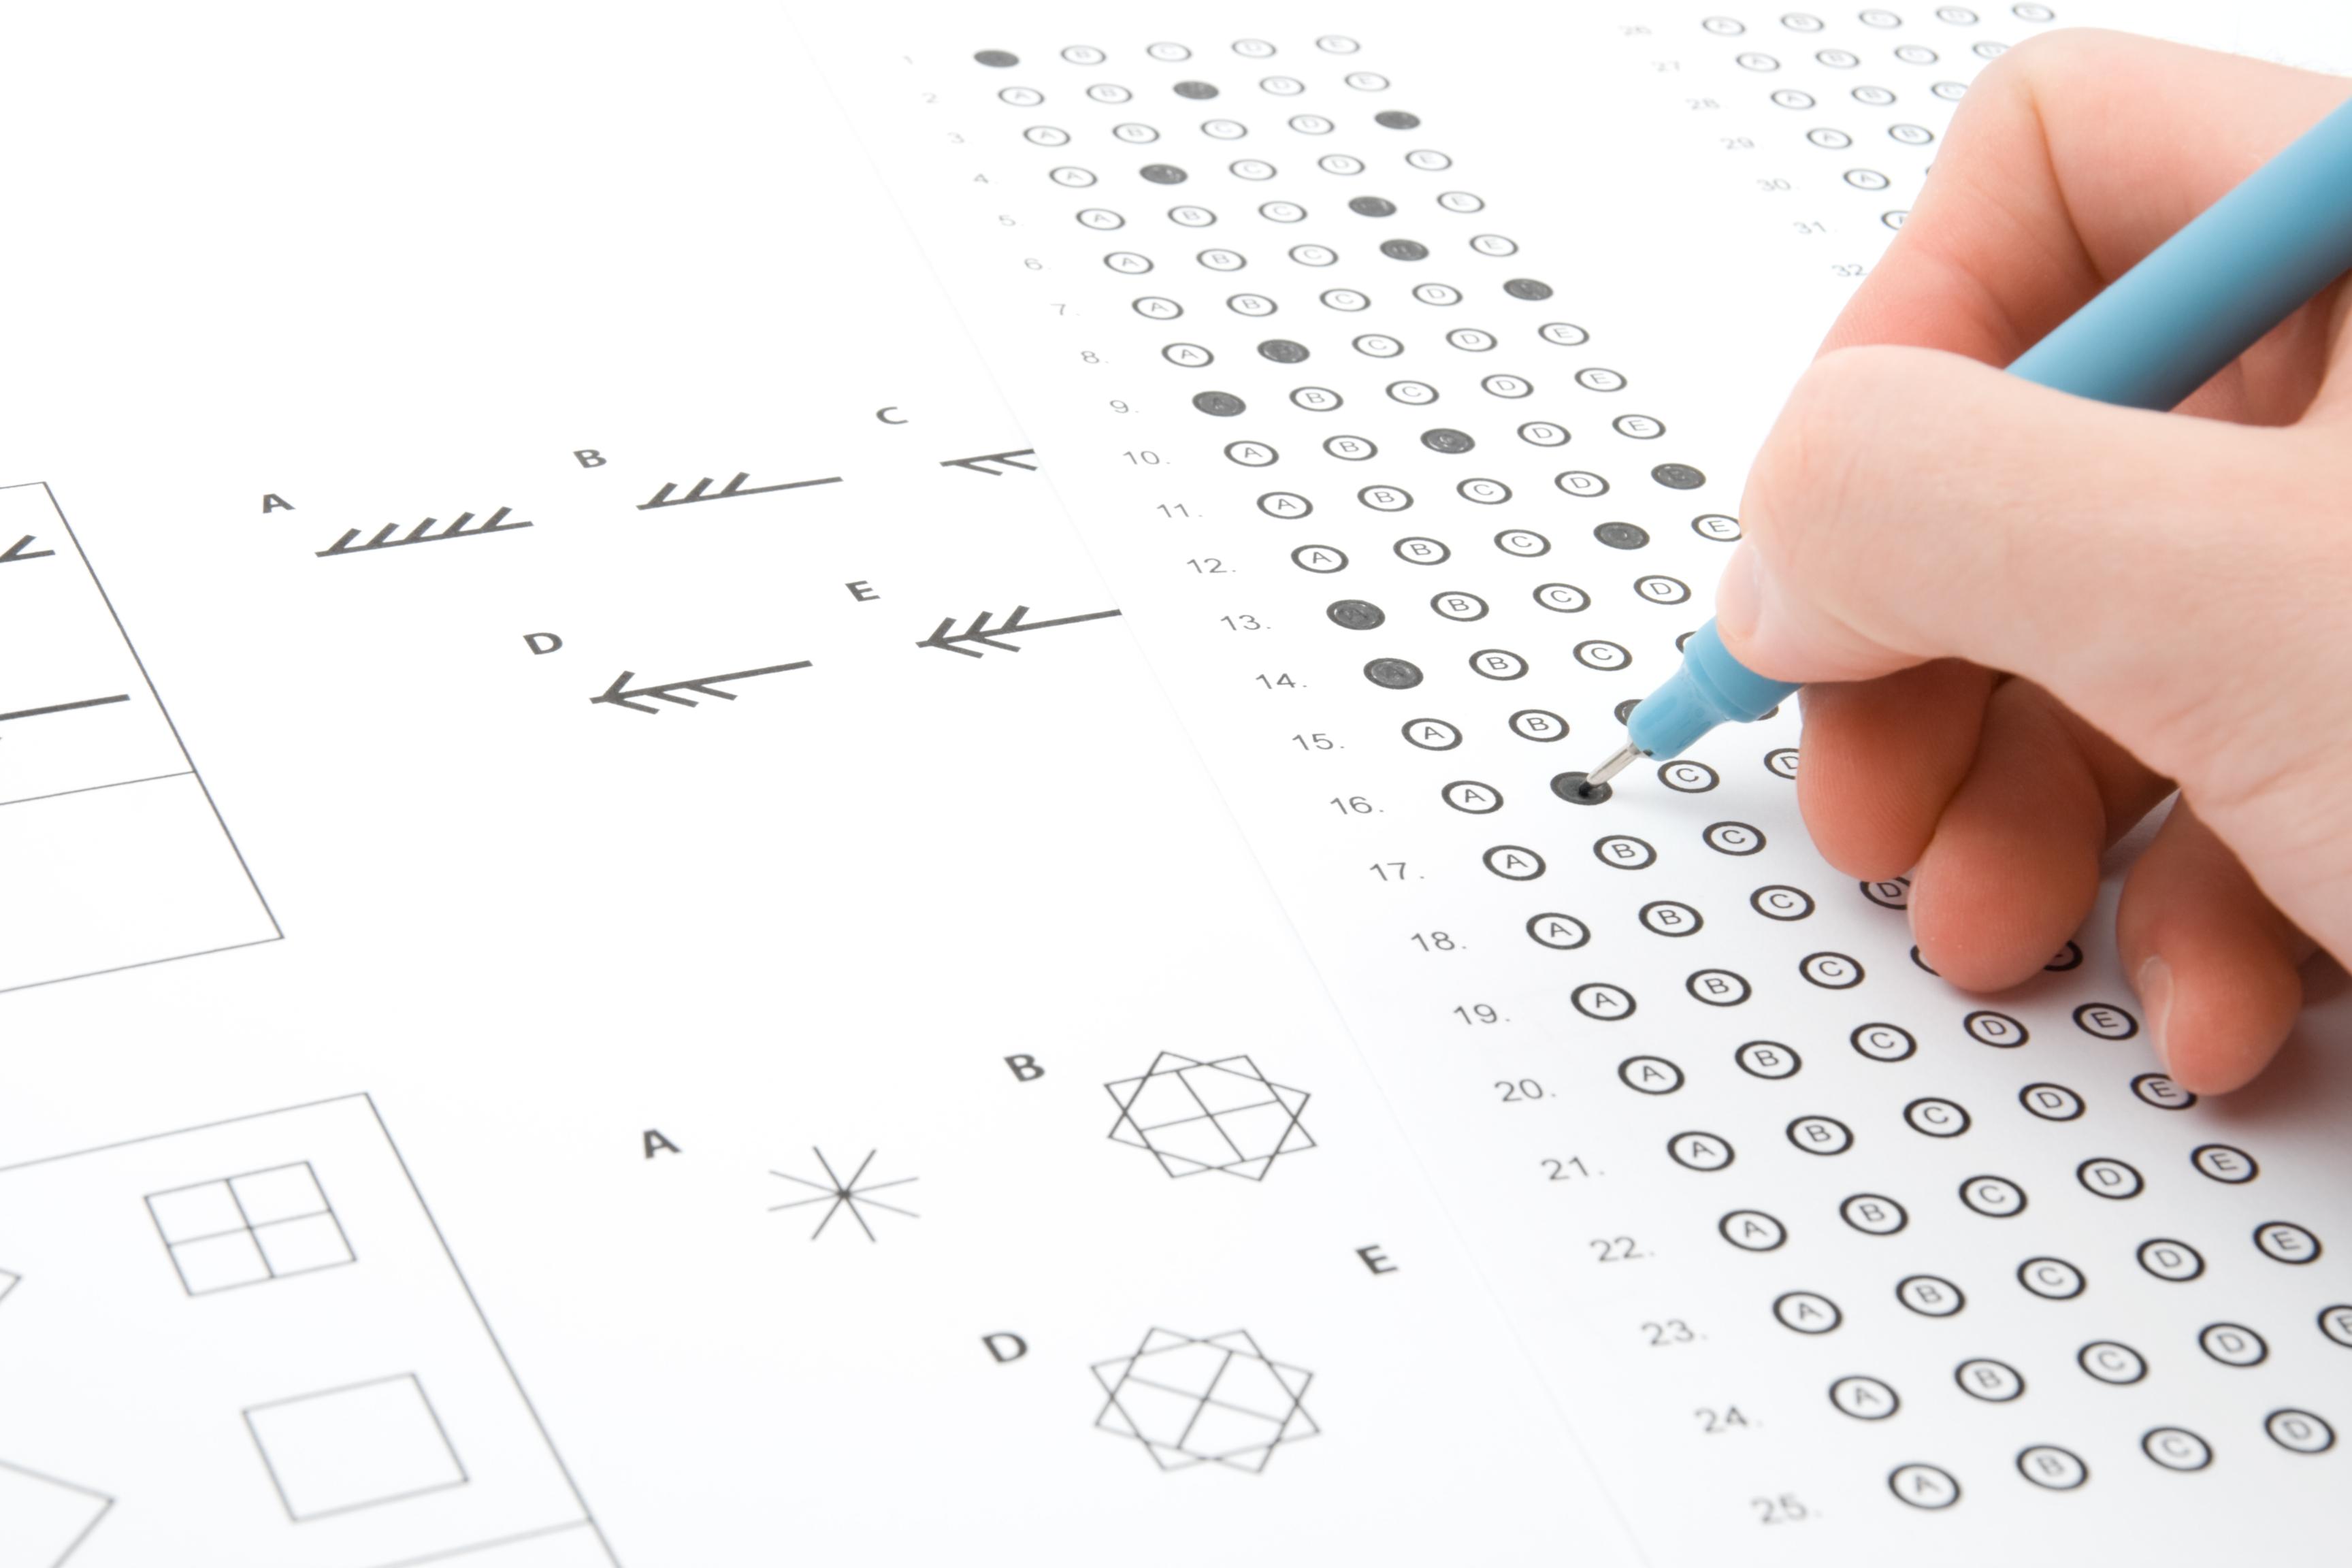 Gandeng Lembaga Psikologi Dr Soetomo untuk Test IQ